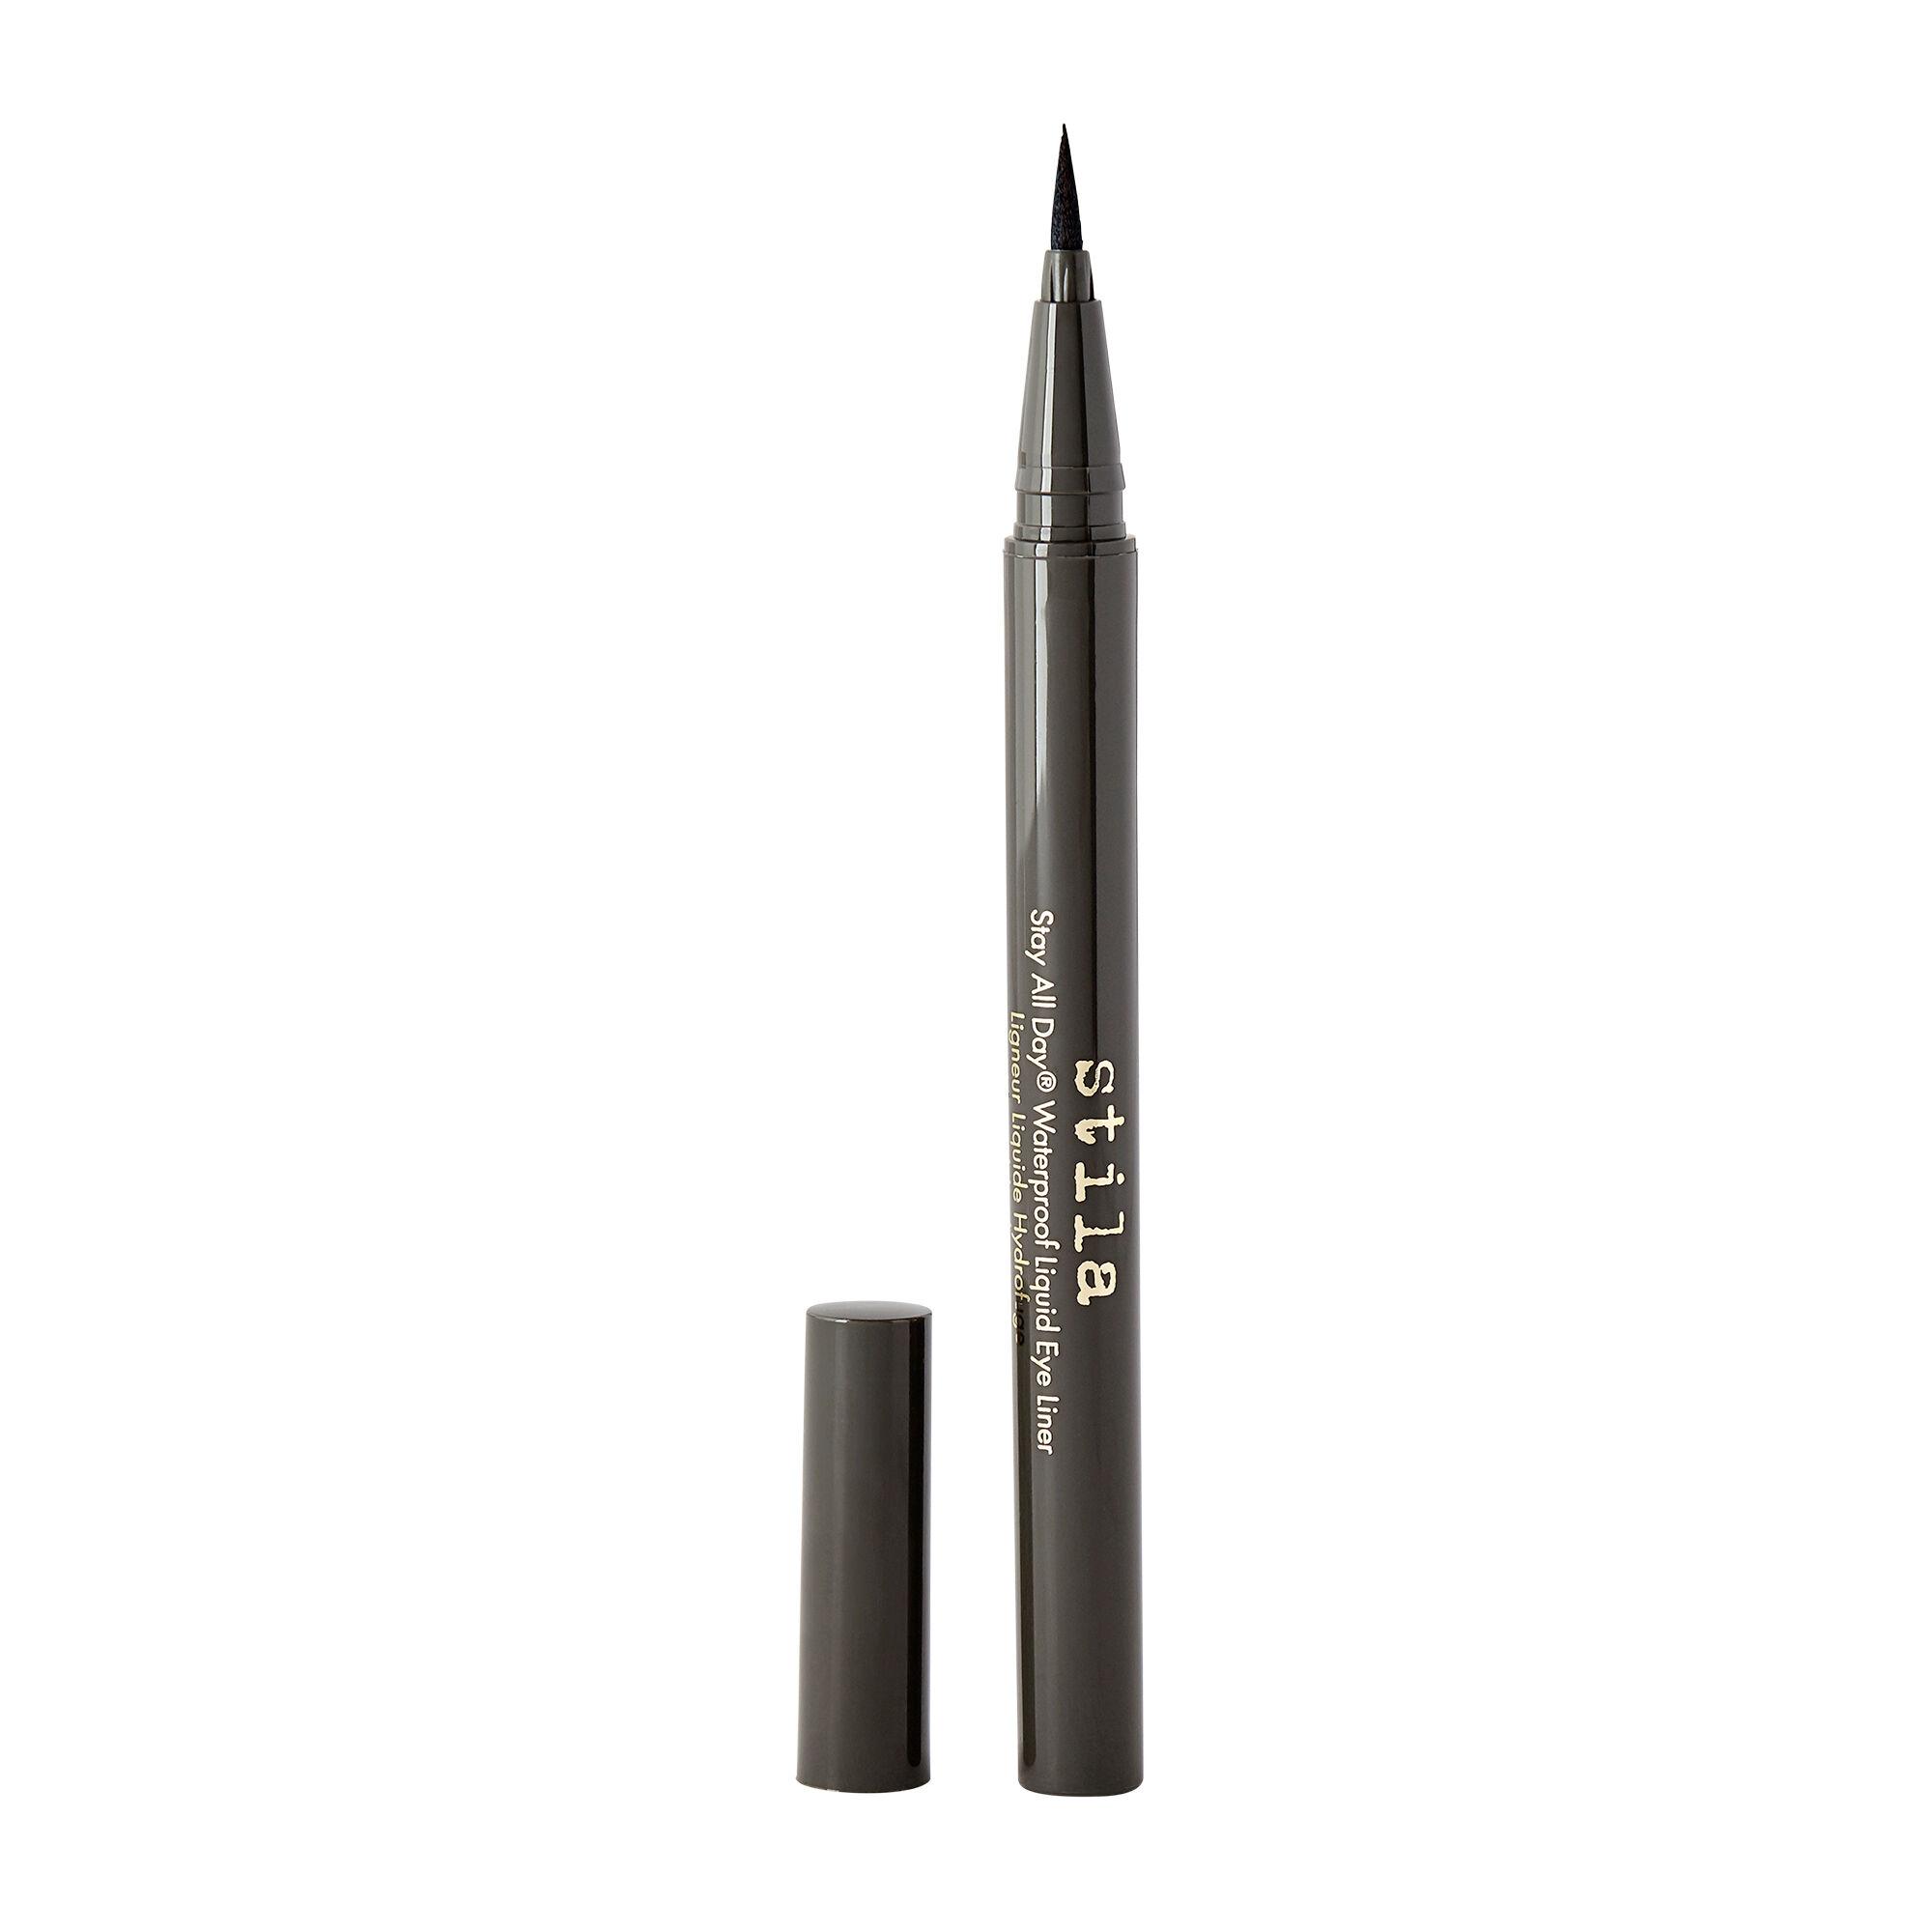 Stila Stay All Day Waterproof Liquid Eye Liner Intense Labradorite 0.5ml